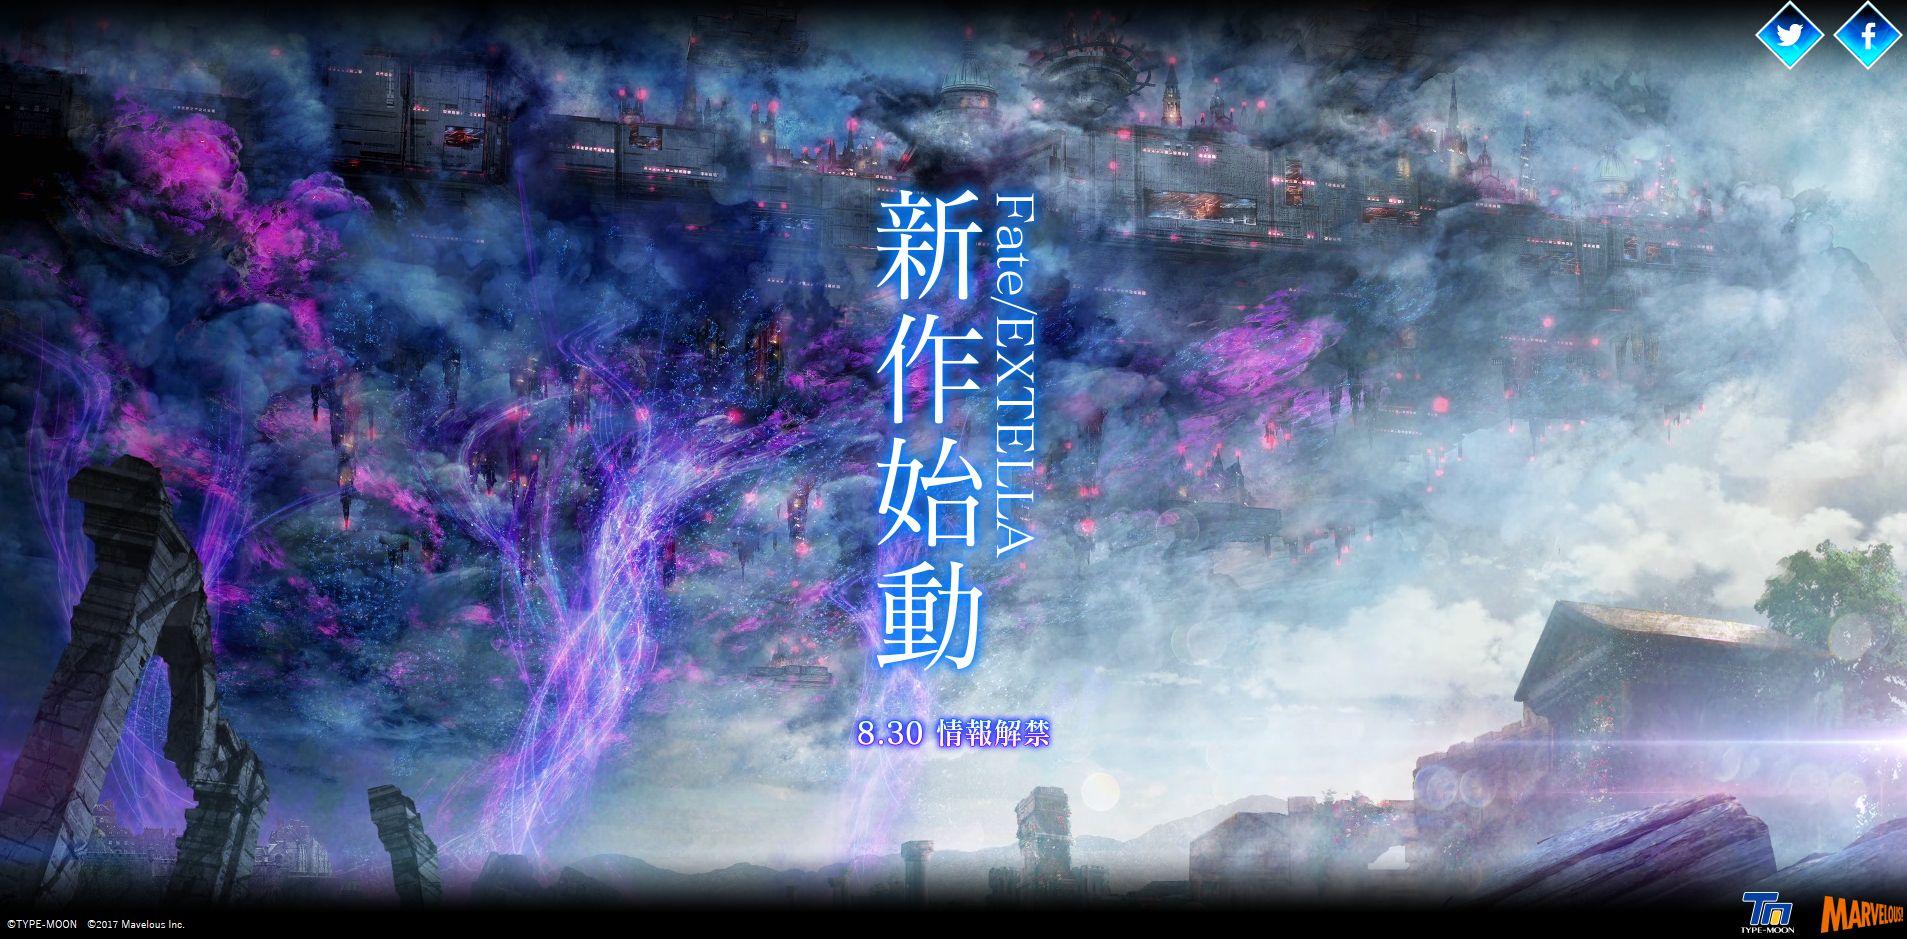 Fate/EXTELLA Fate/EXTELLA新作に望むこと「モデリング改善」「ストレスのないゲーム性にしてほしい」